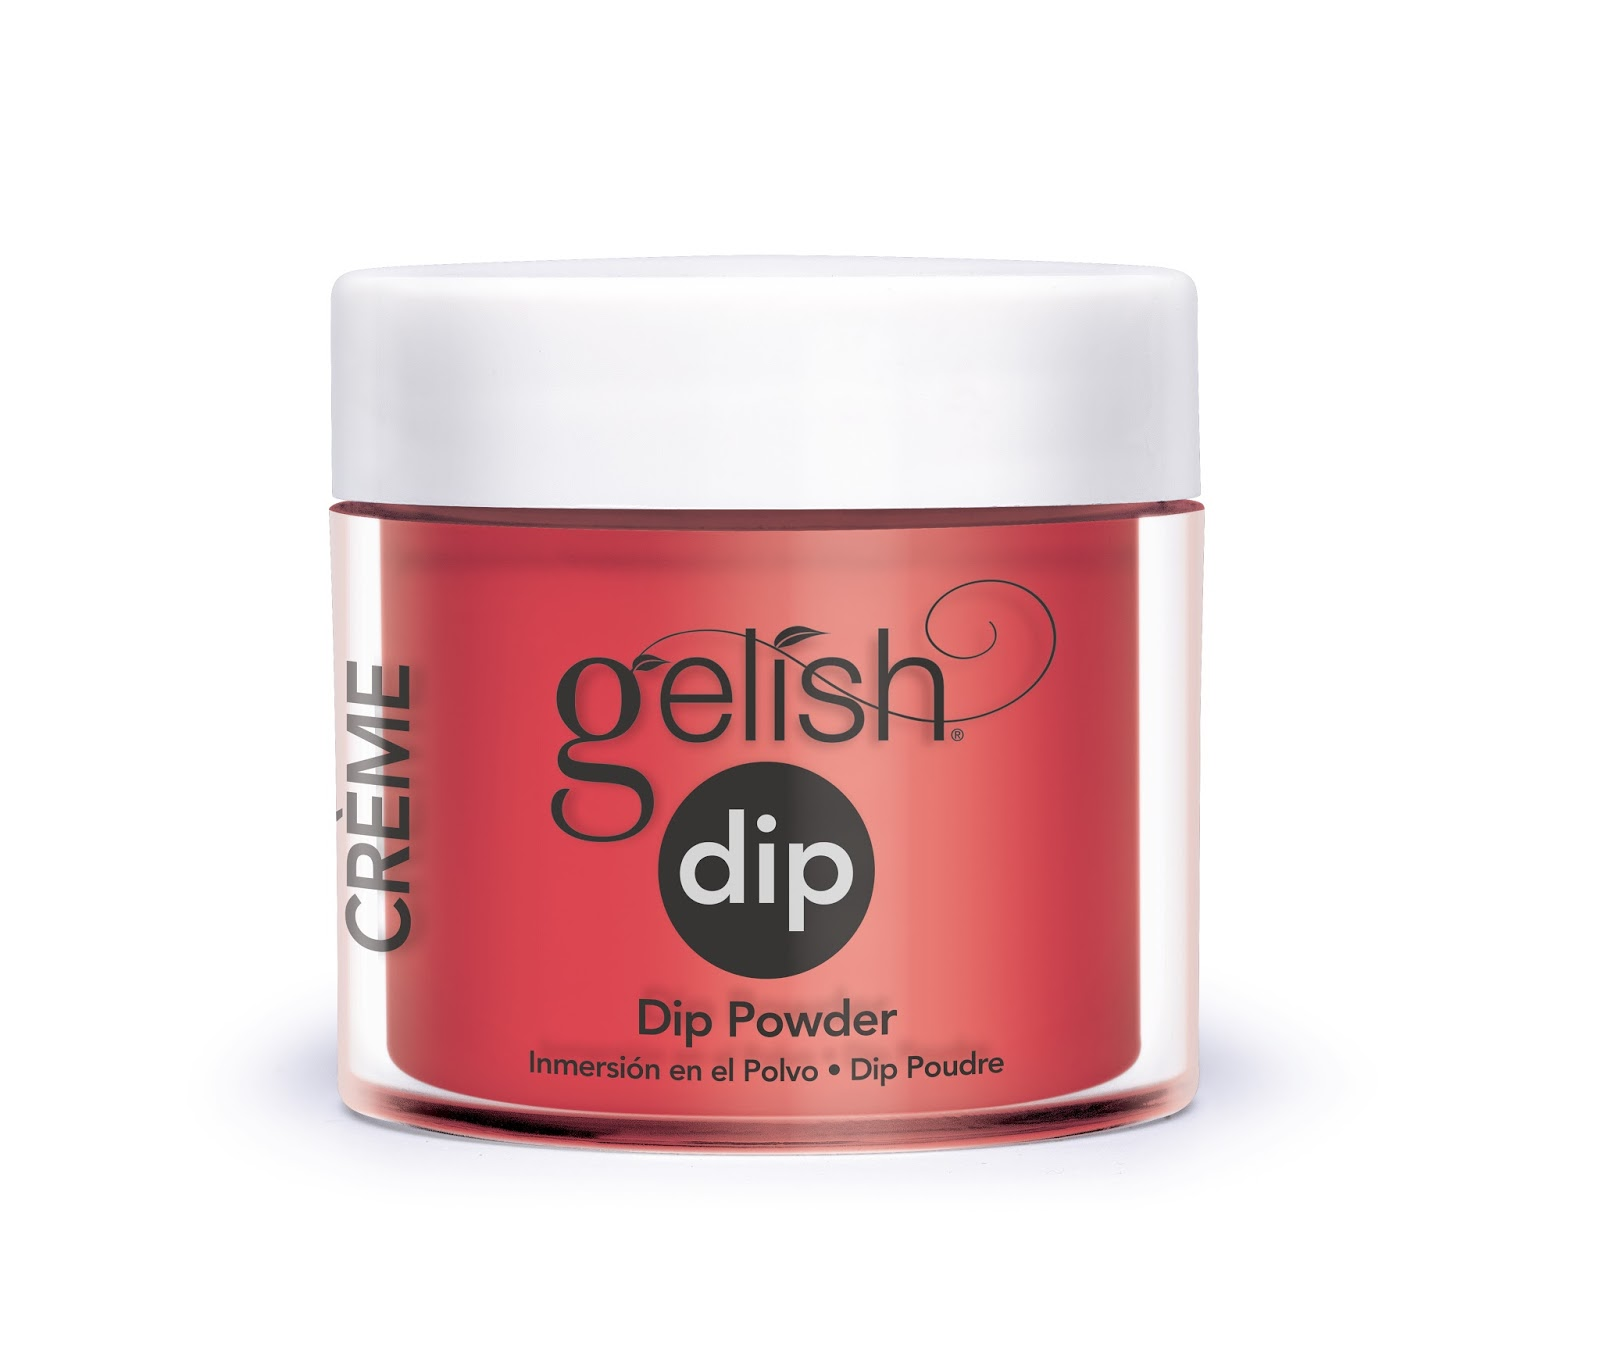 Bambi De La Cruz Makeup Artistry Blog: Gelish Dip: No-chip